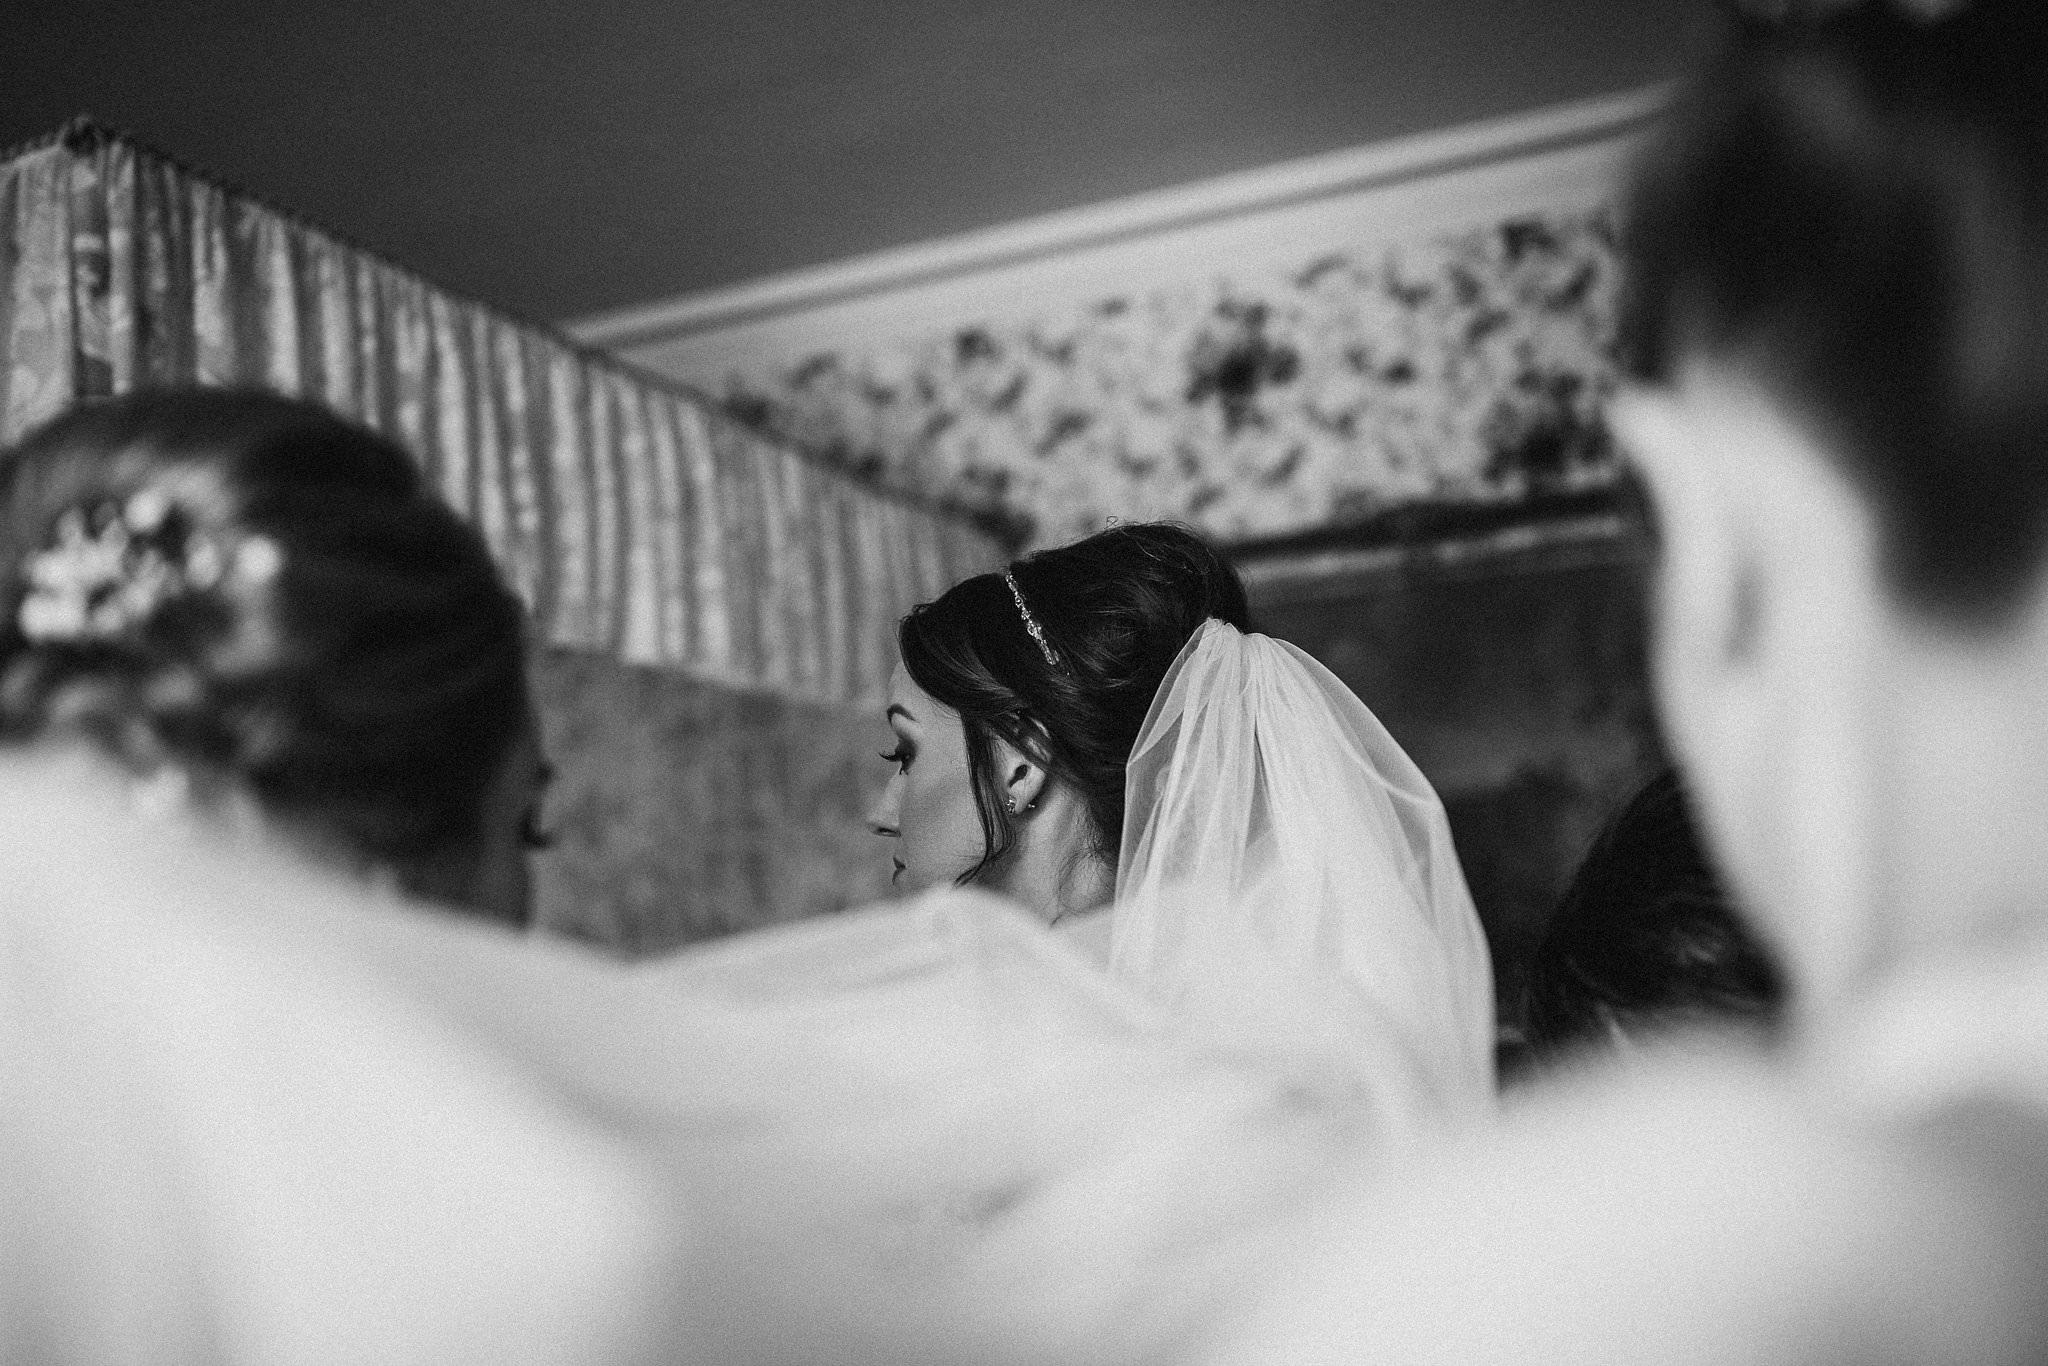 kirknewton stables wedding photographer (12).jpg